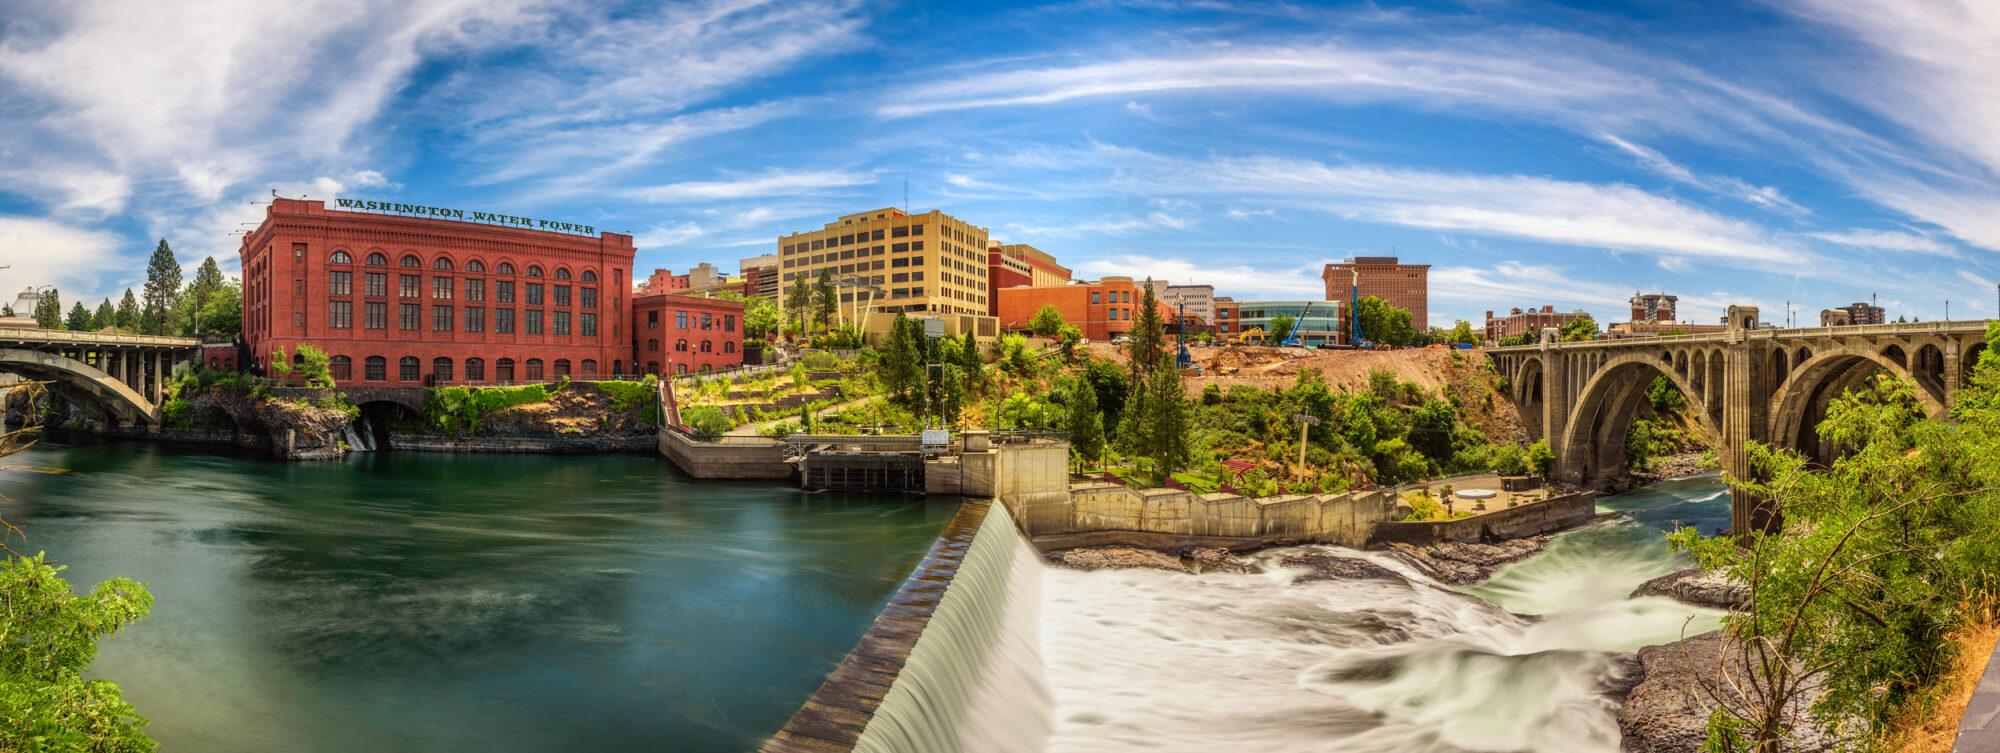 Downtown Spokane River Panorama